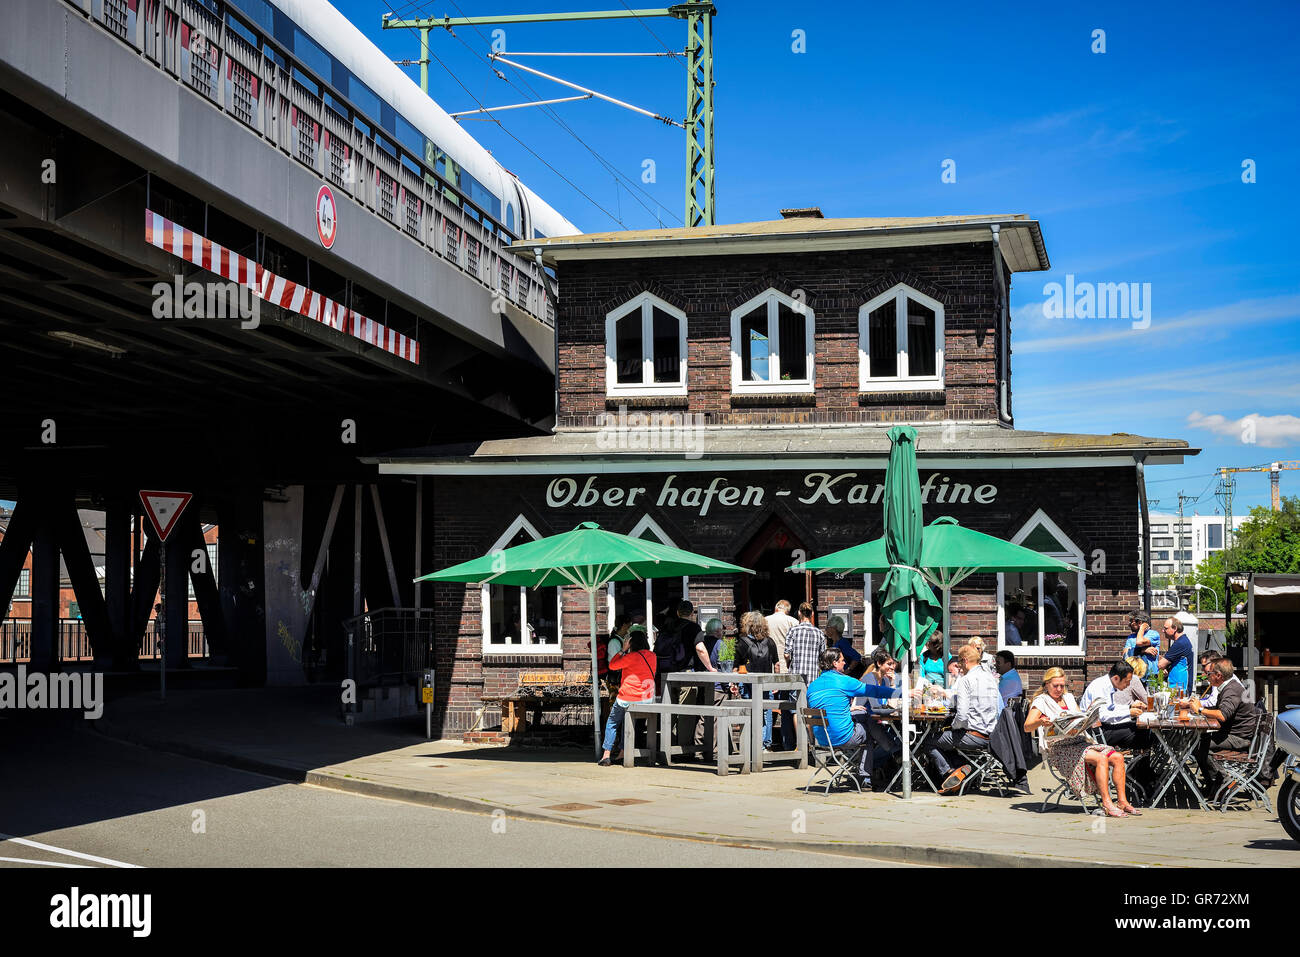 Oberhafen-Kantine In Hamburg, Germany - Stock Image